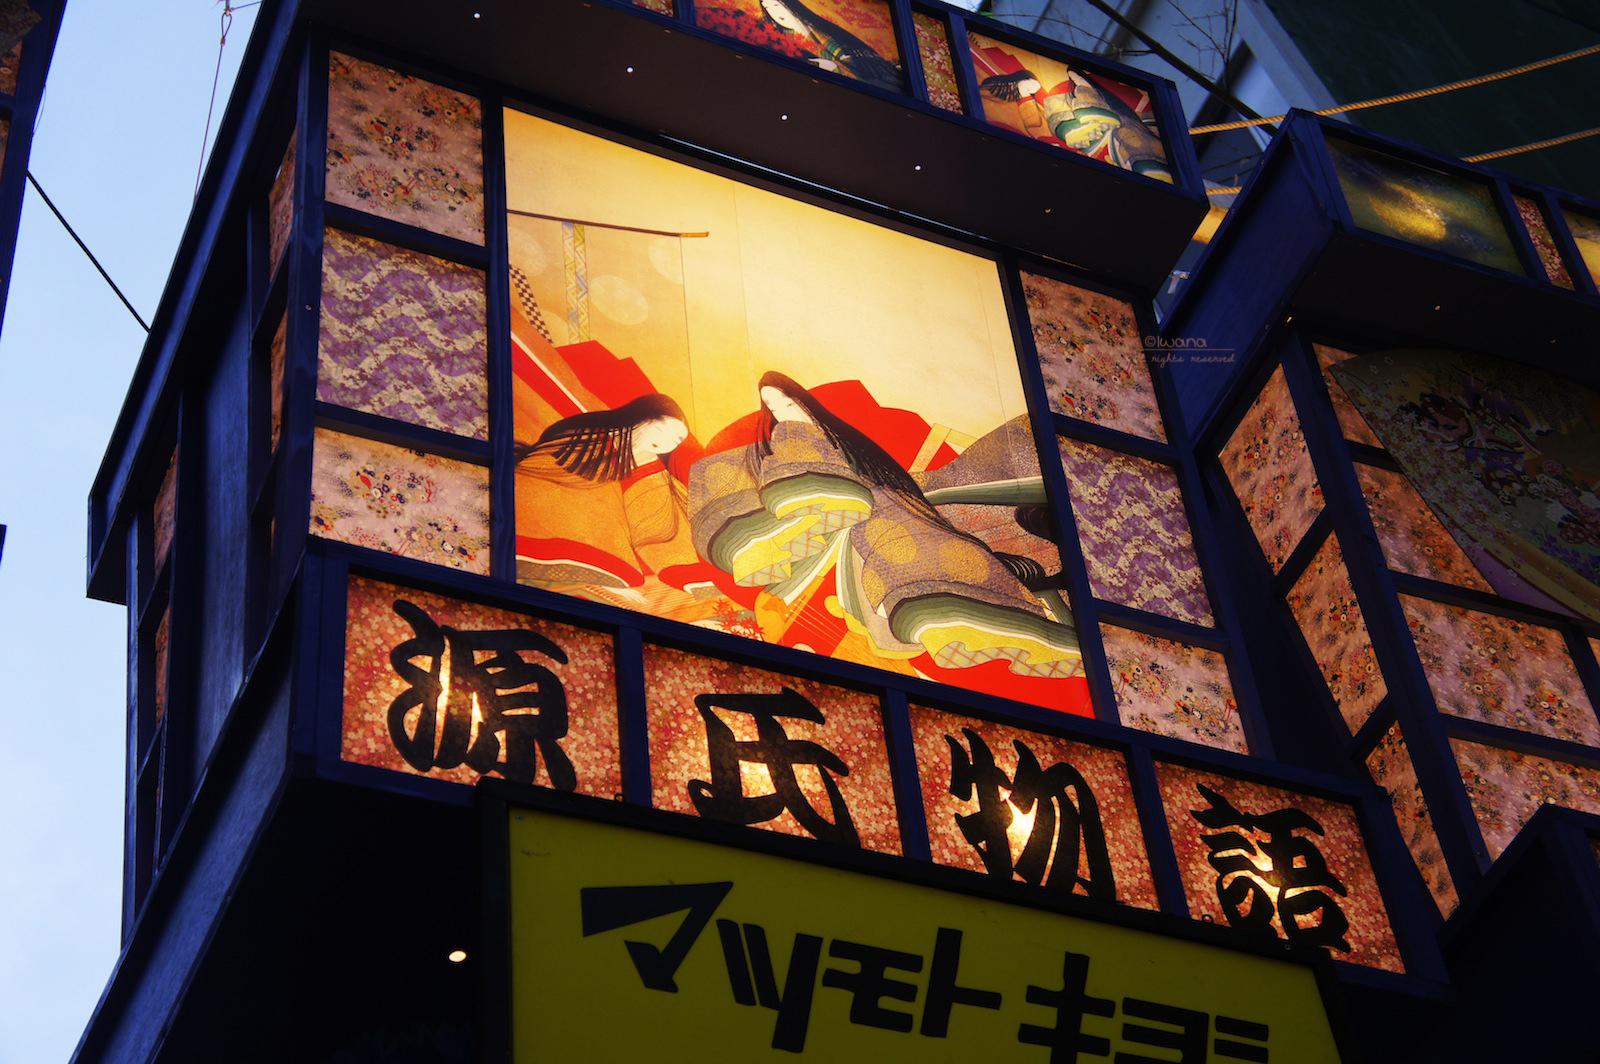 tanabata matsuri 2 by iwazakana